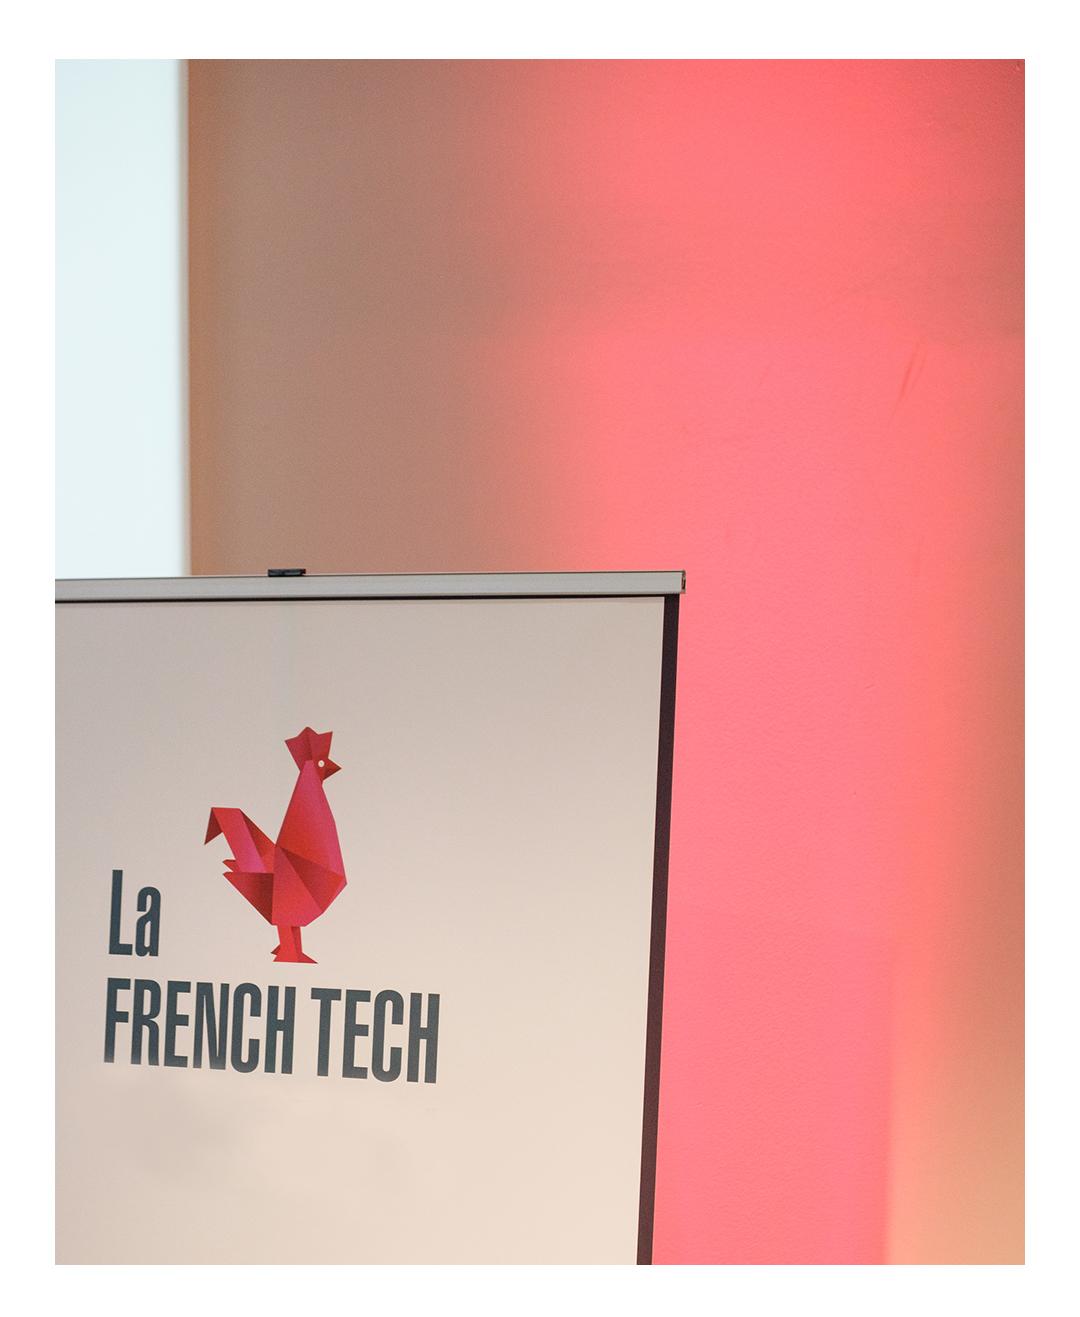 Logo French Tech et écriture, kakemono